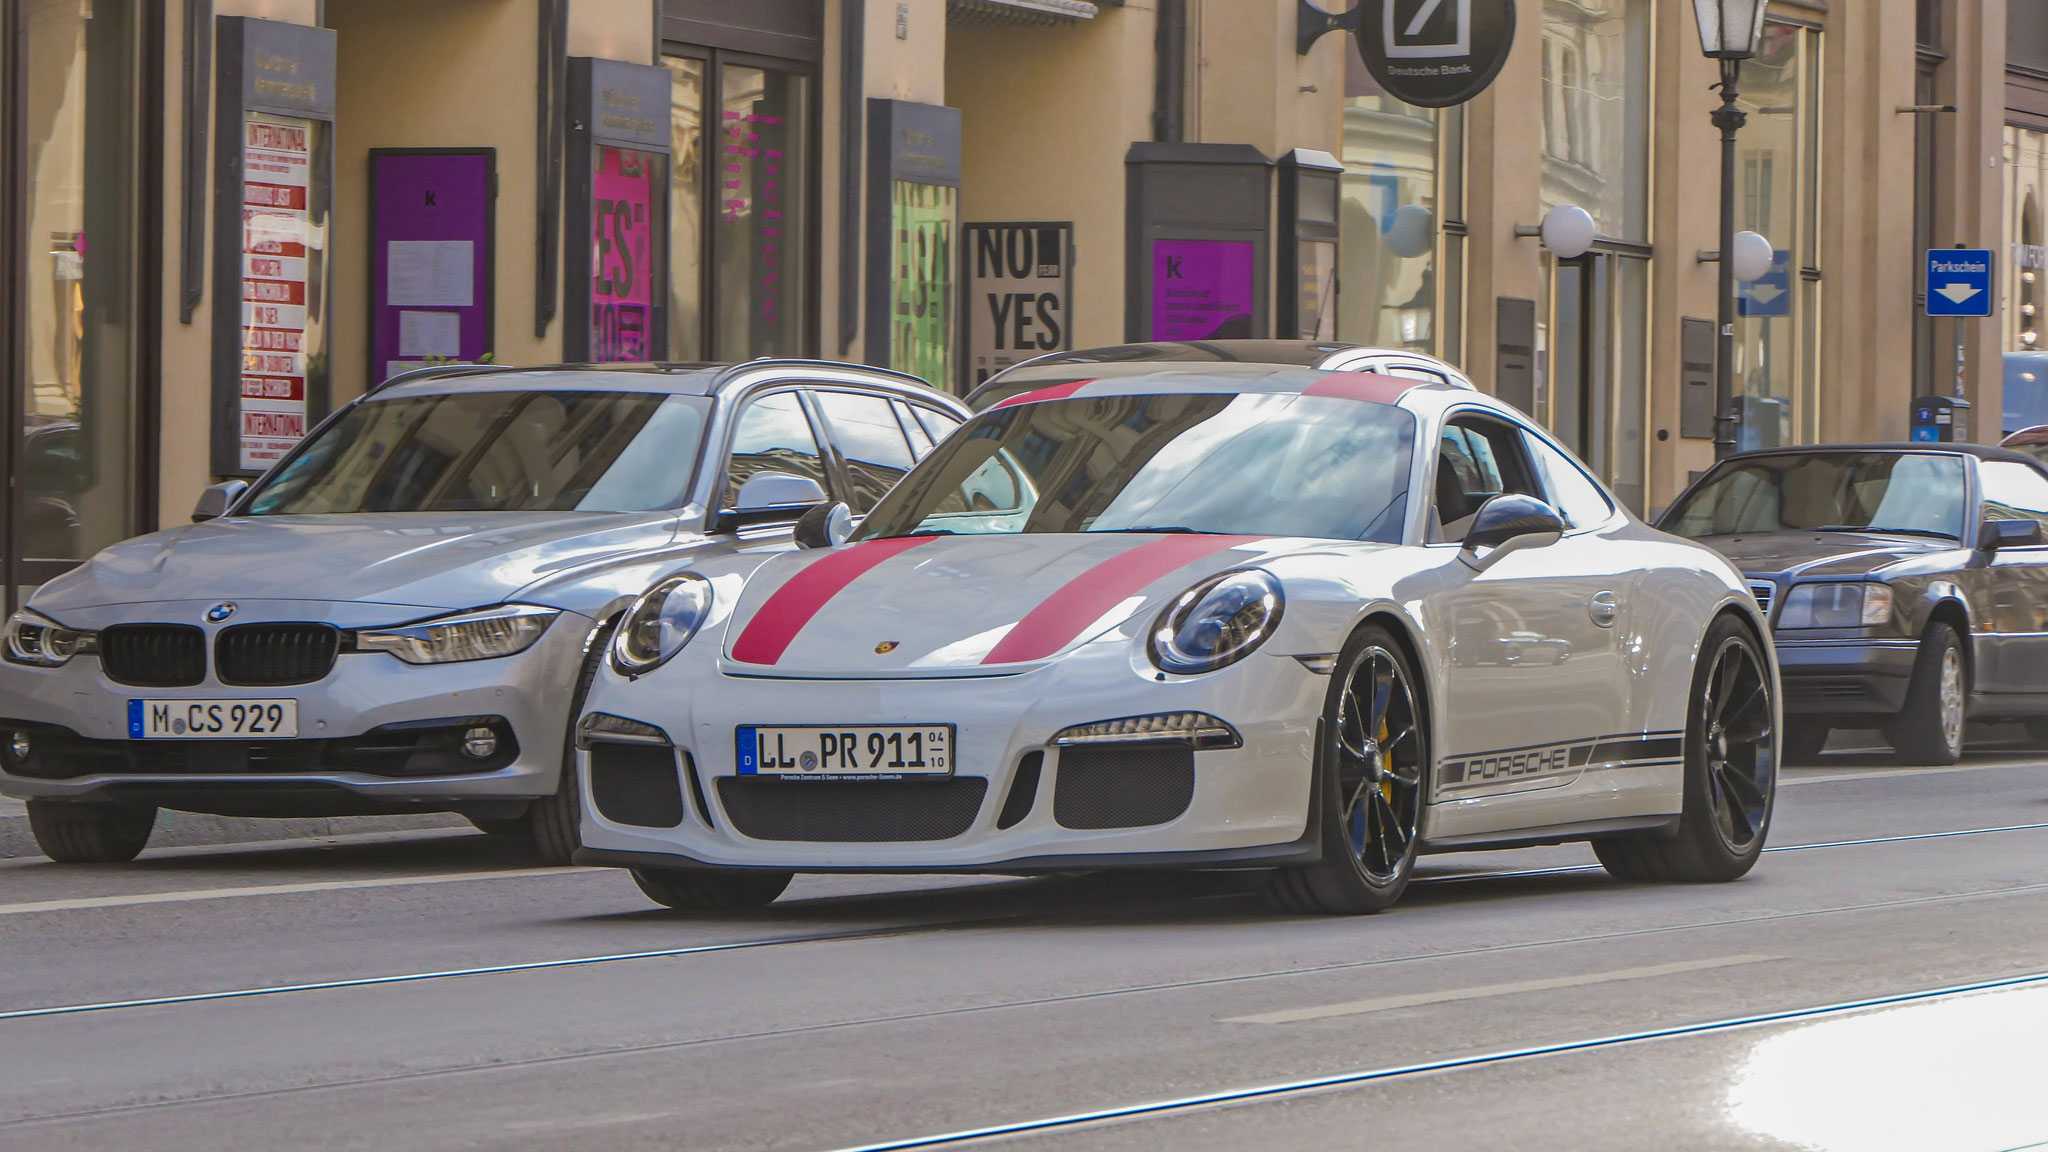 Porsche 911 R - LL-PR-911